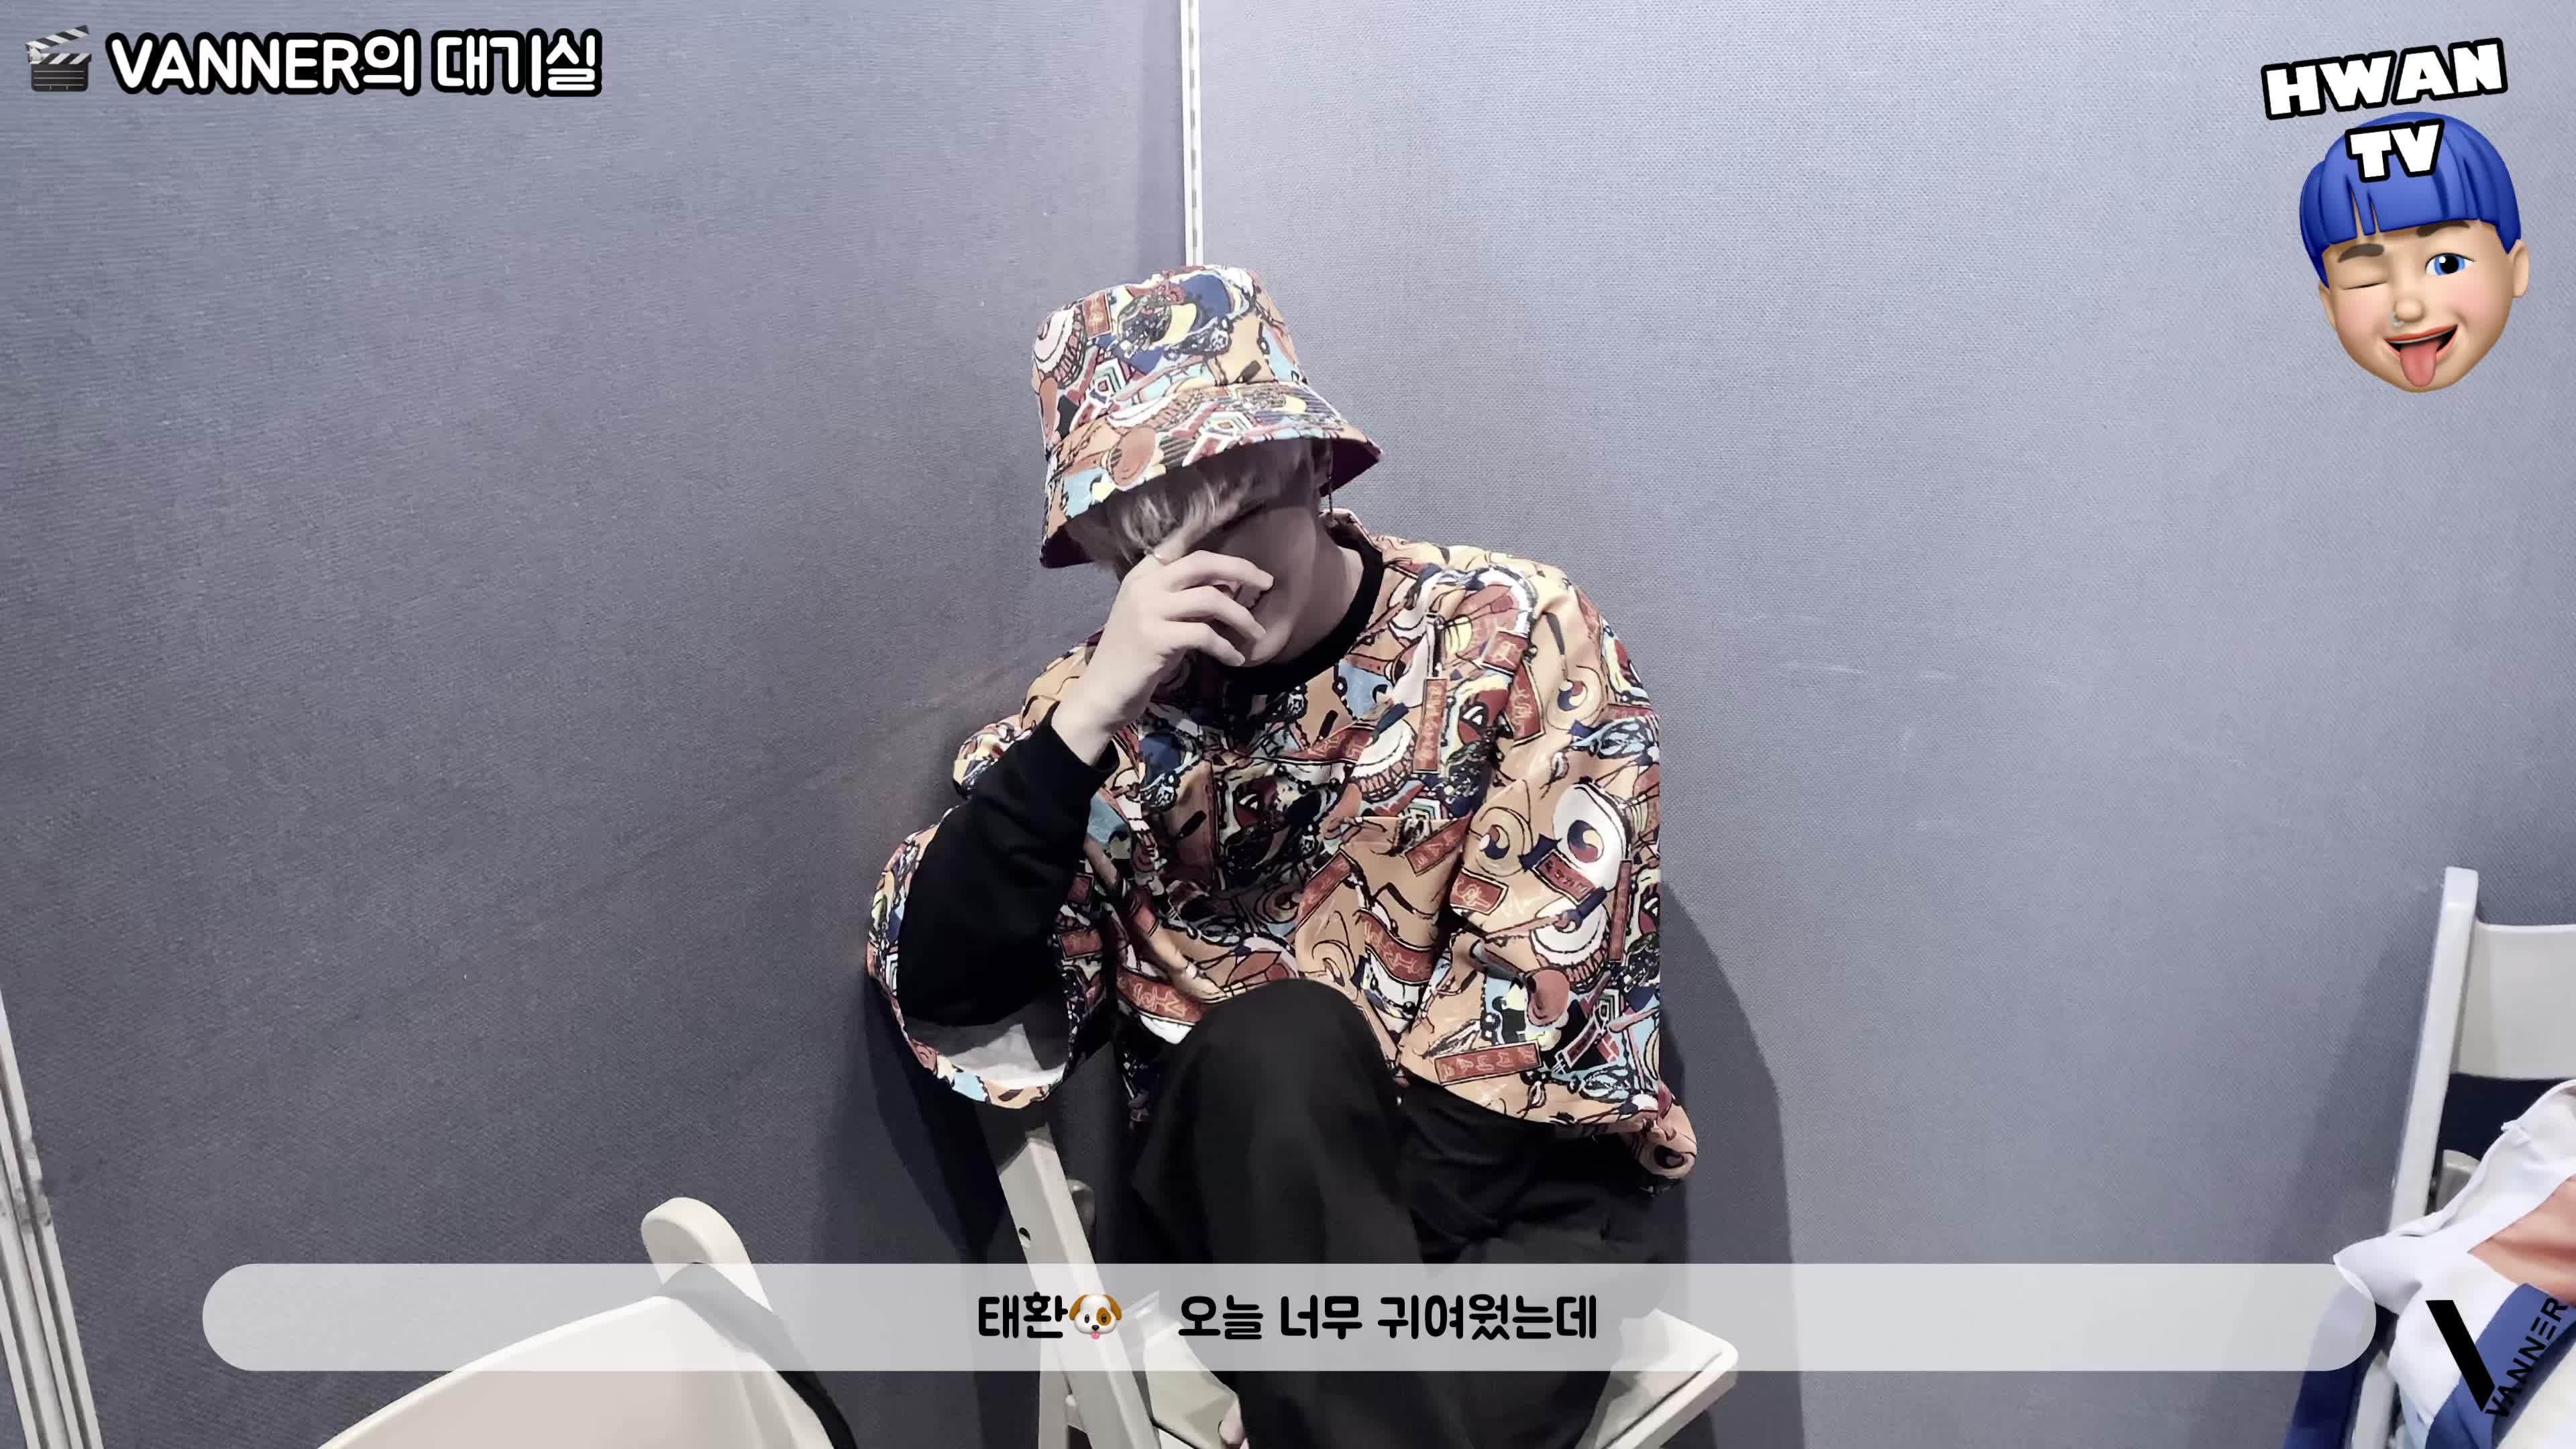 [HWAN TV Season2] 12. VANNER의 미쳐버려 막방